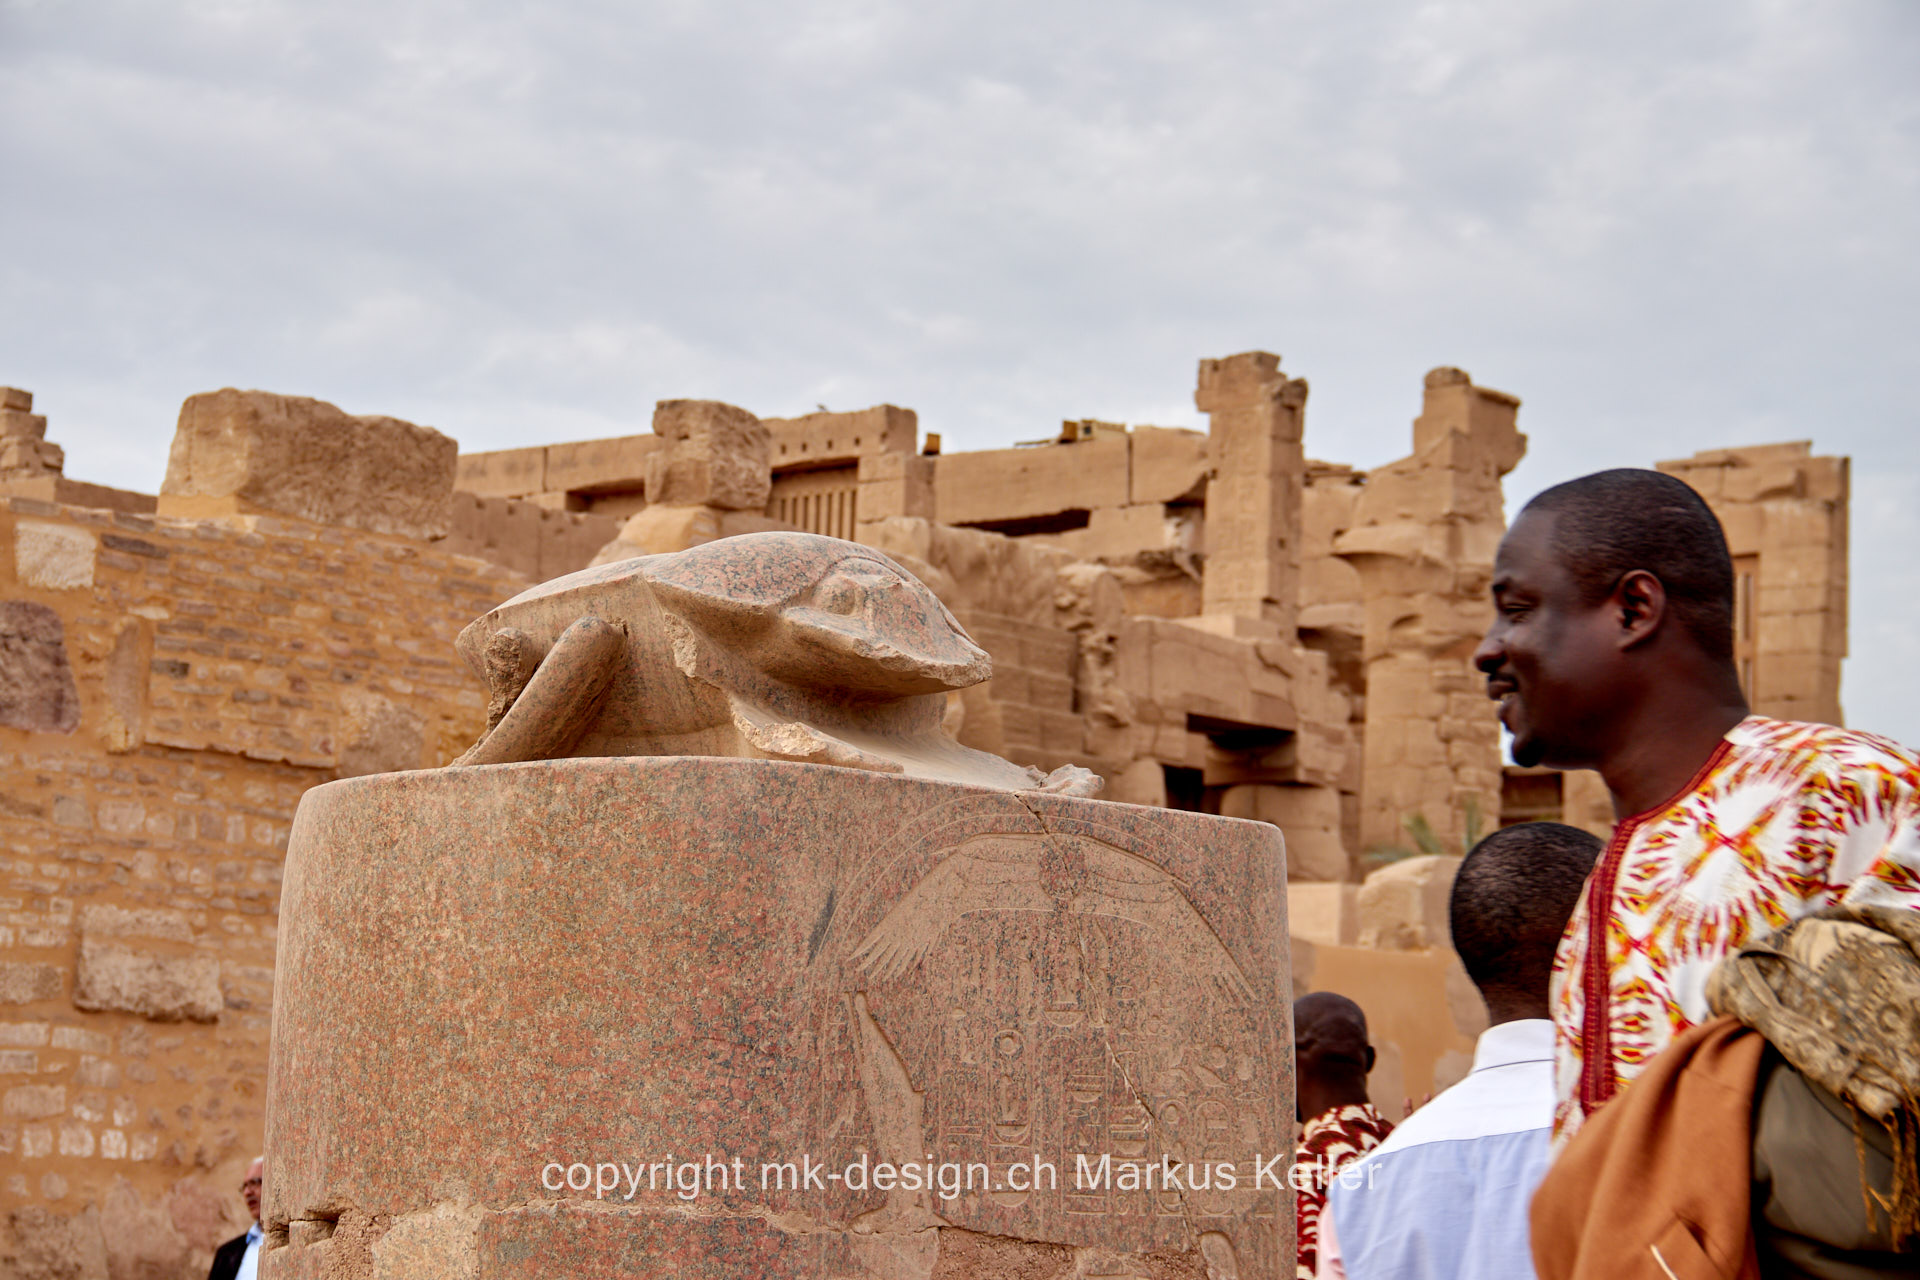 Bauwerk   Tempel   Karnak   Statue/Skulptur